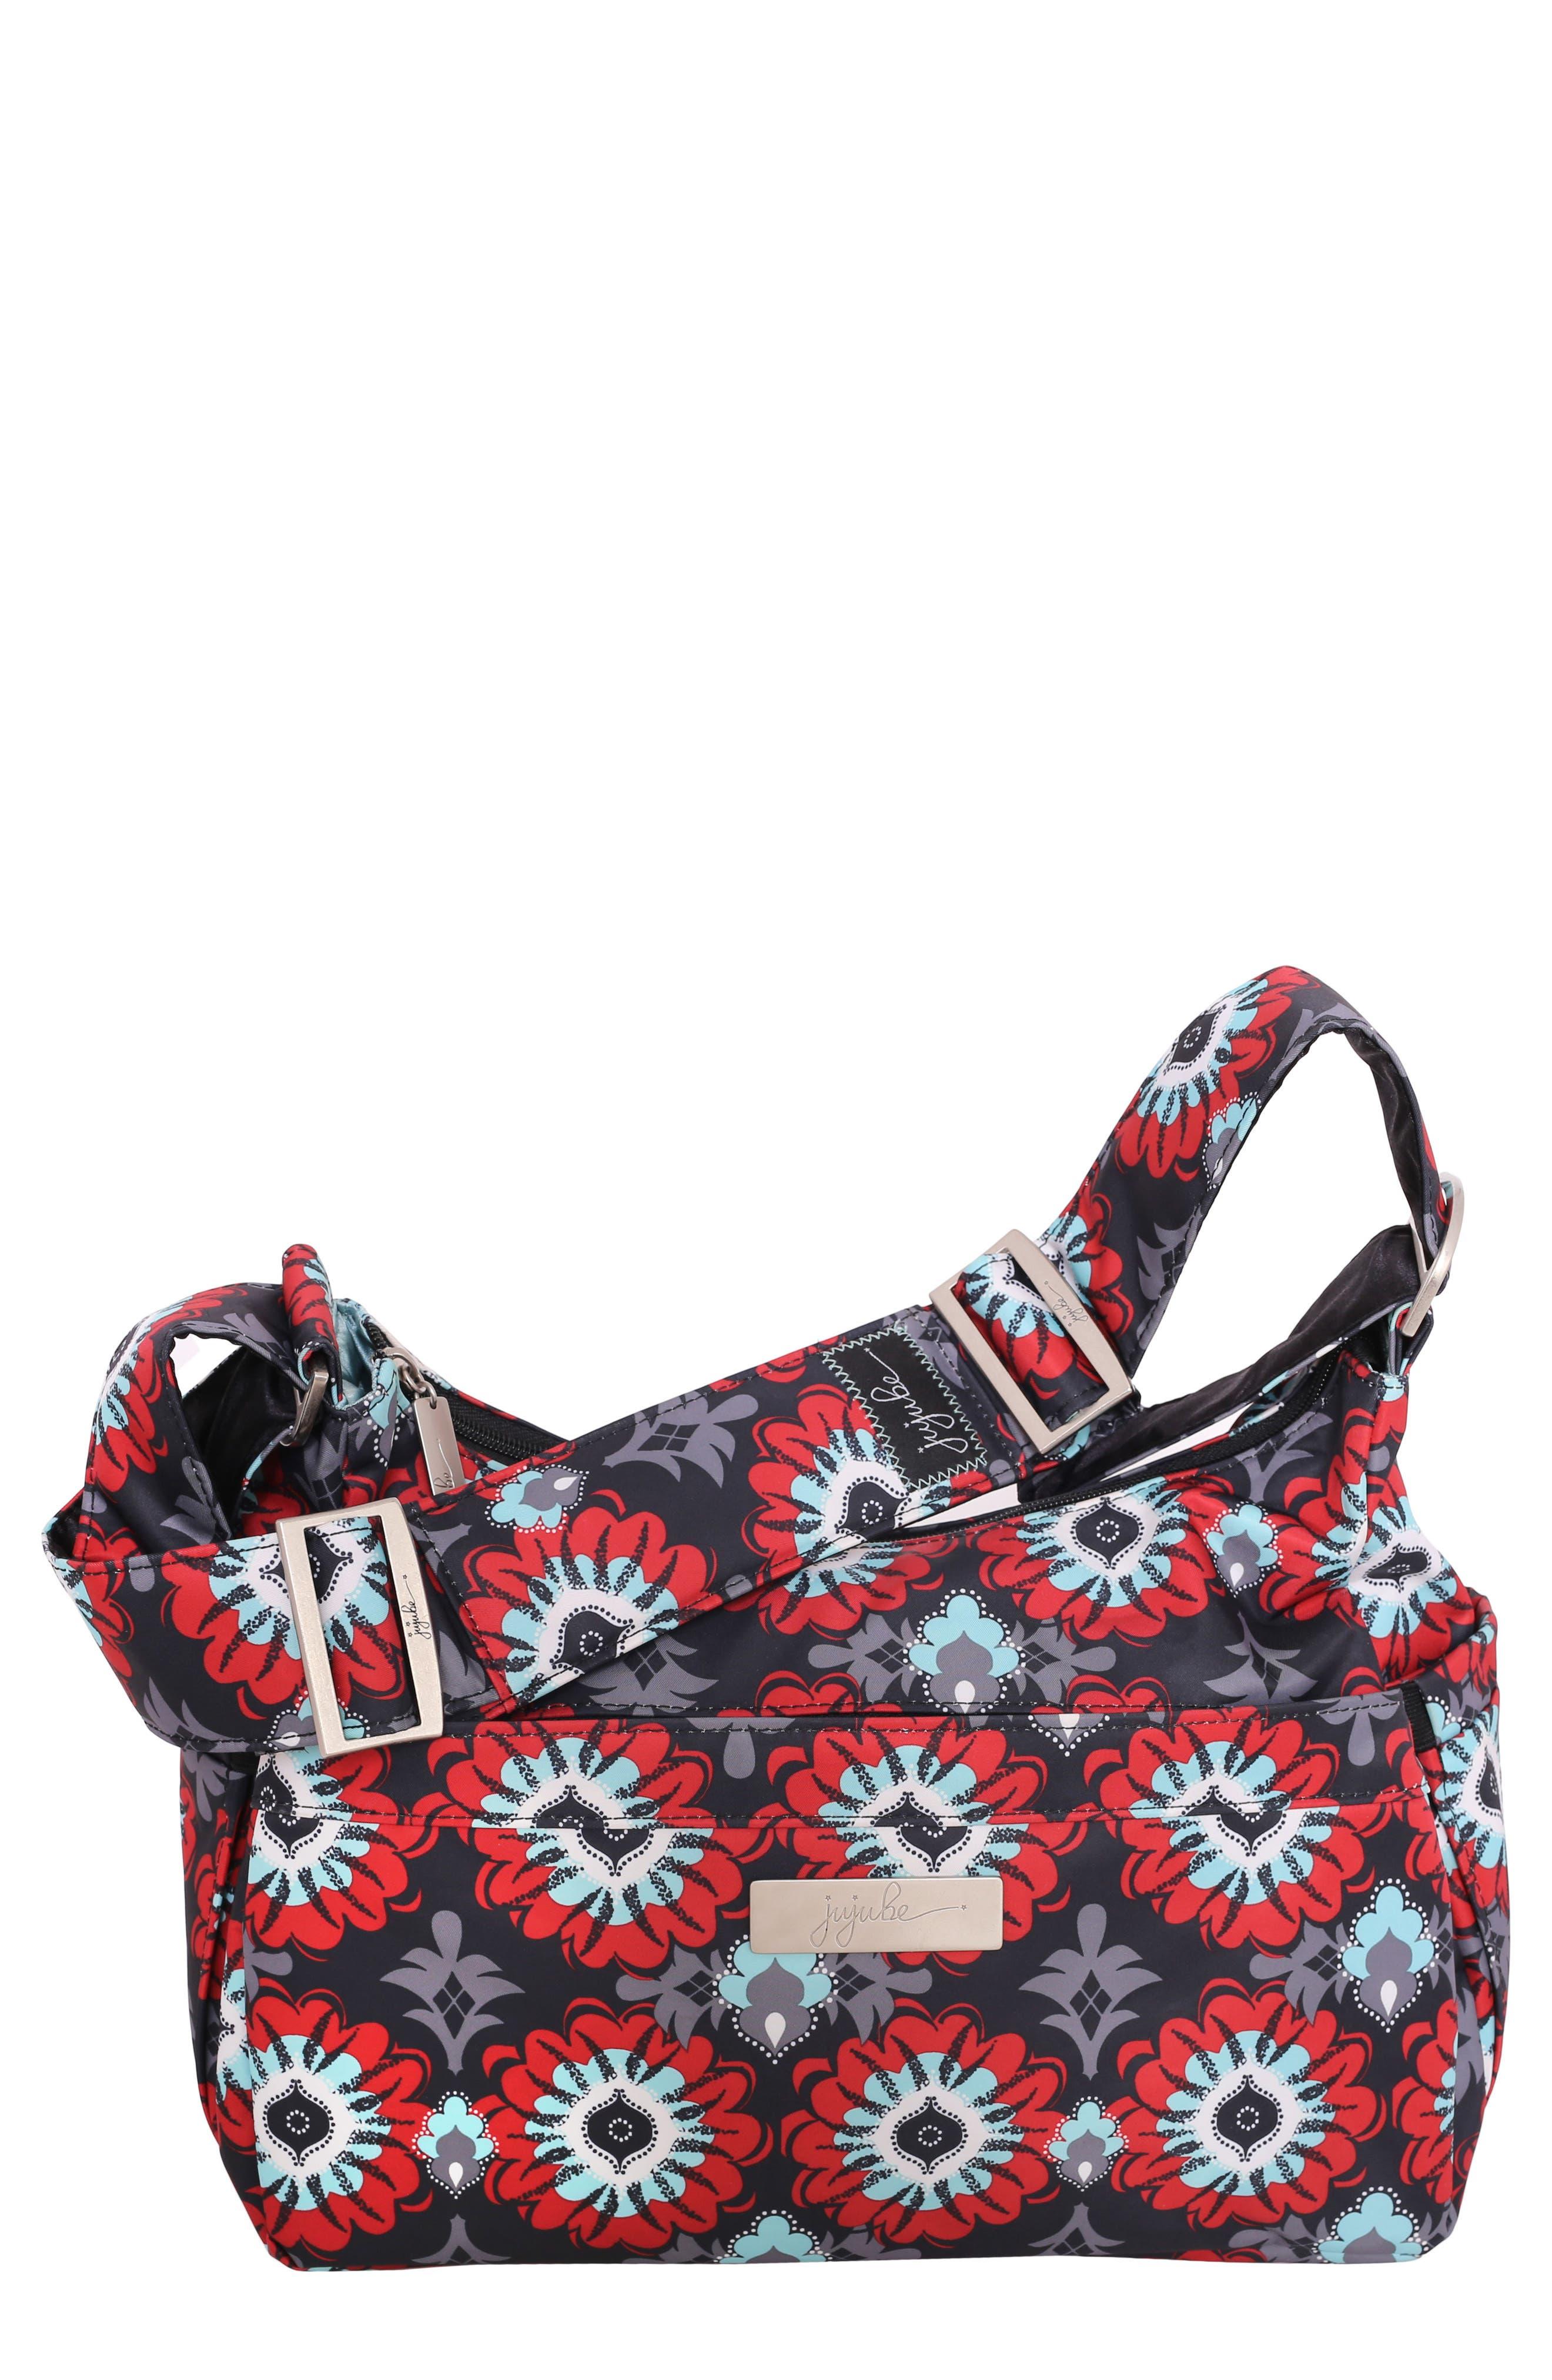 'HoboBe' Diaper Bag,                         Main,                         color, SWEET SCARLET